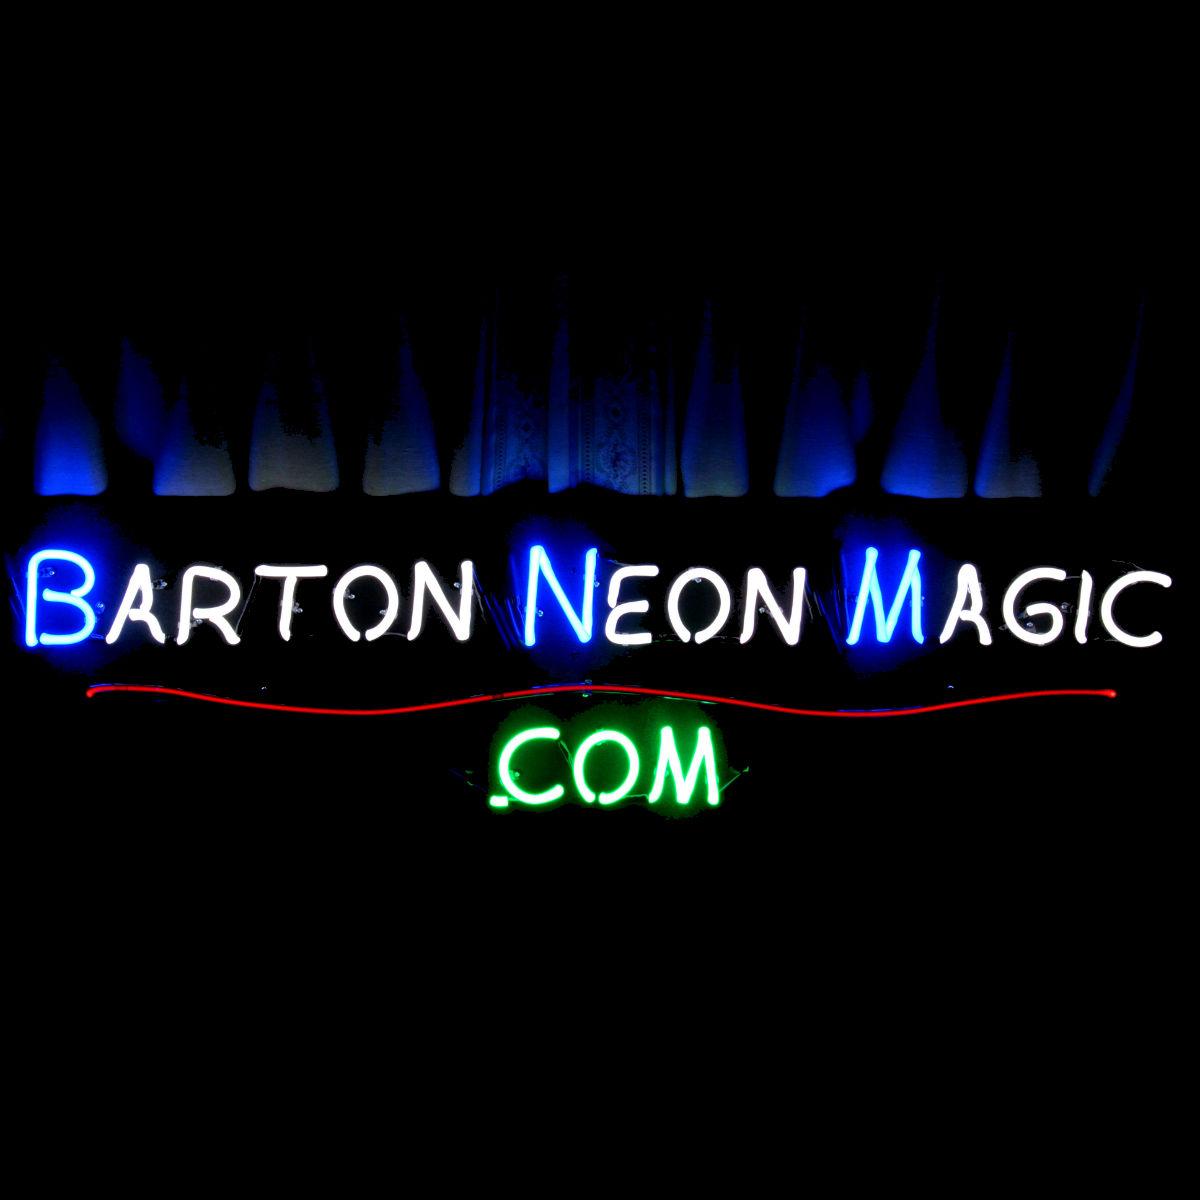 Custom Designer Neon Lighting by John Barton - Famous USA Neon Glass Artist - BartonNeonMagic.com